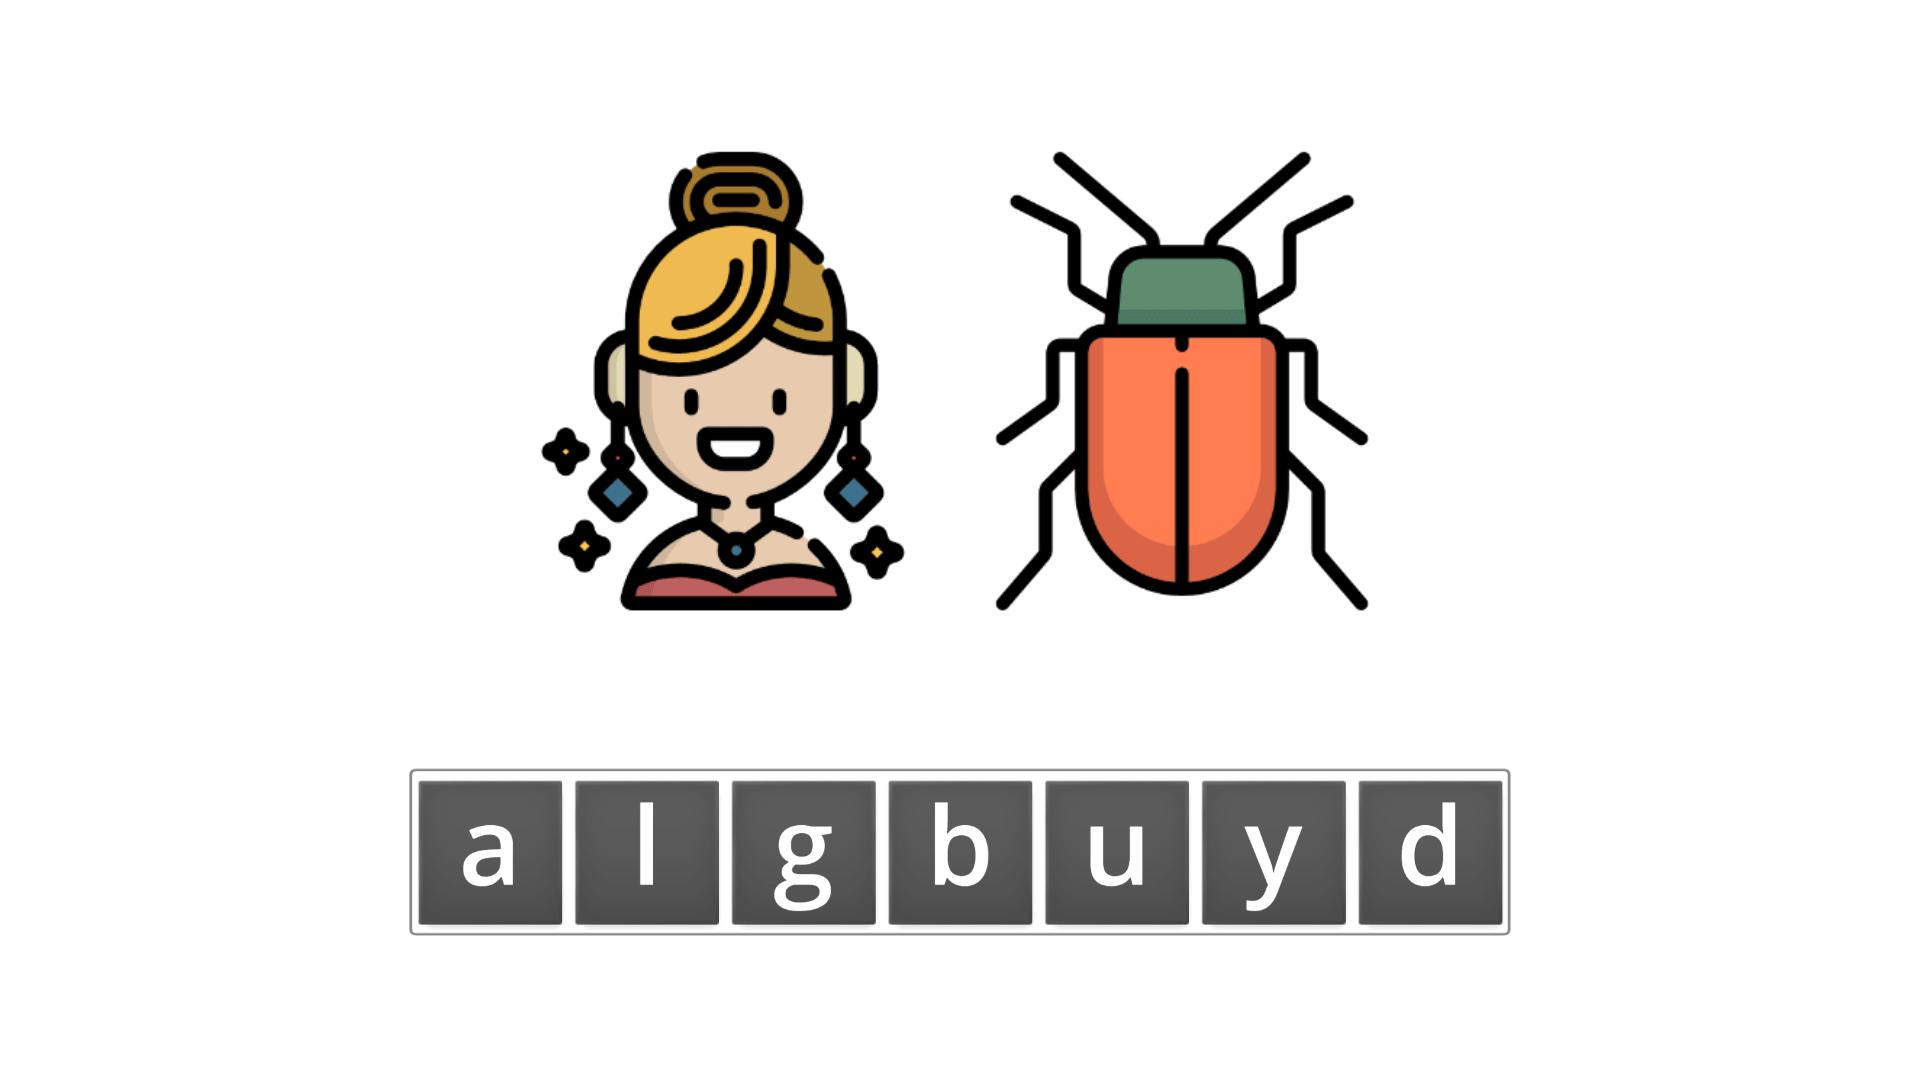 esl resources - flashcards - compound nouns  - unscramble - ladybug